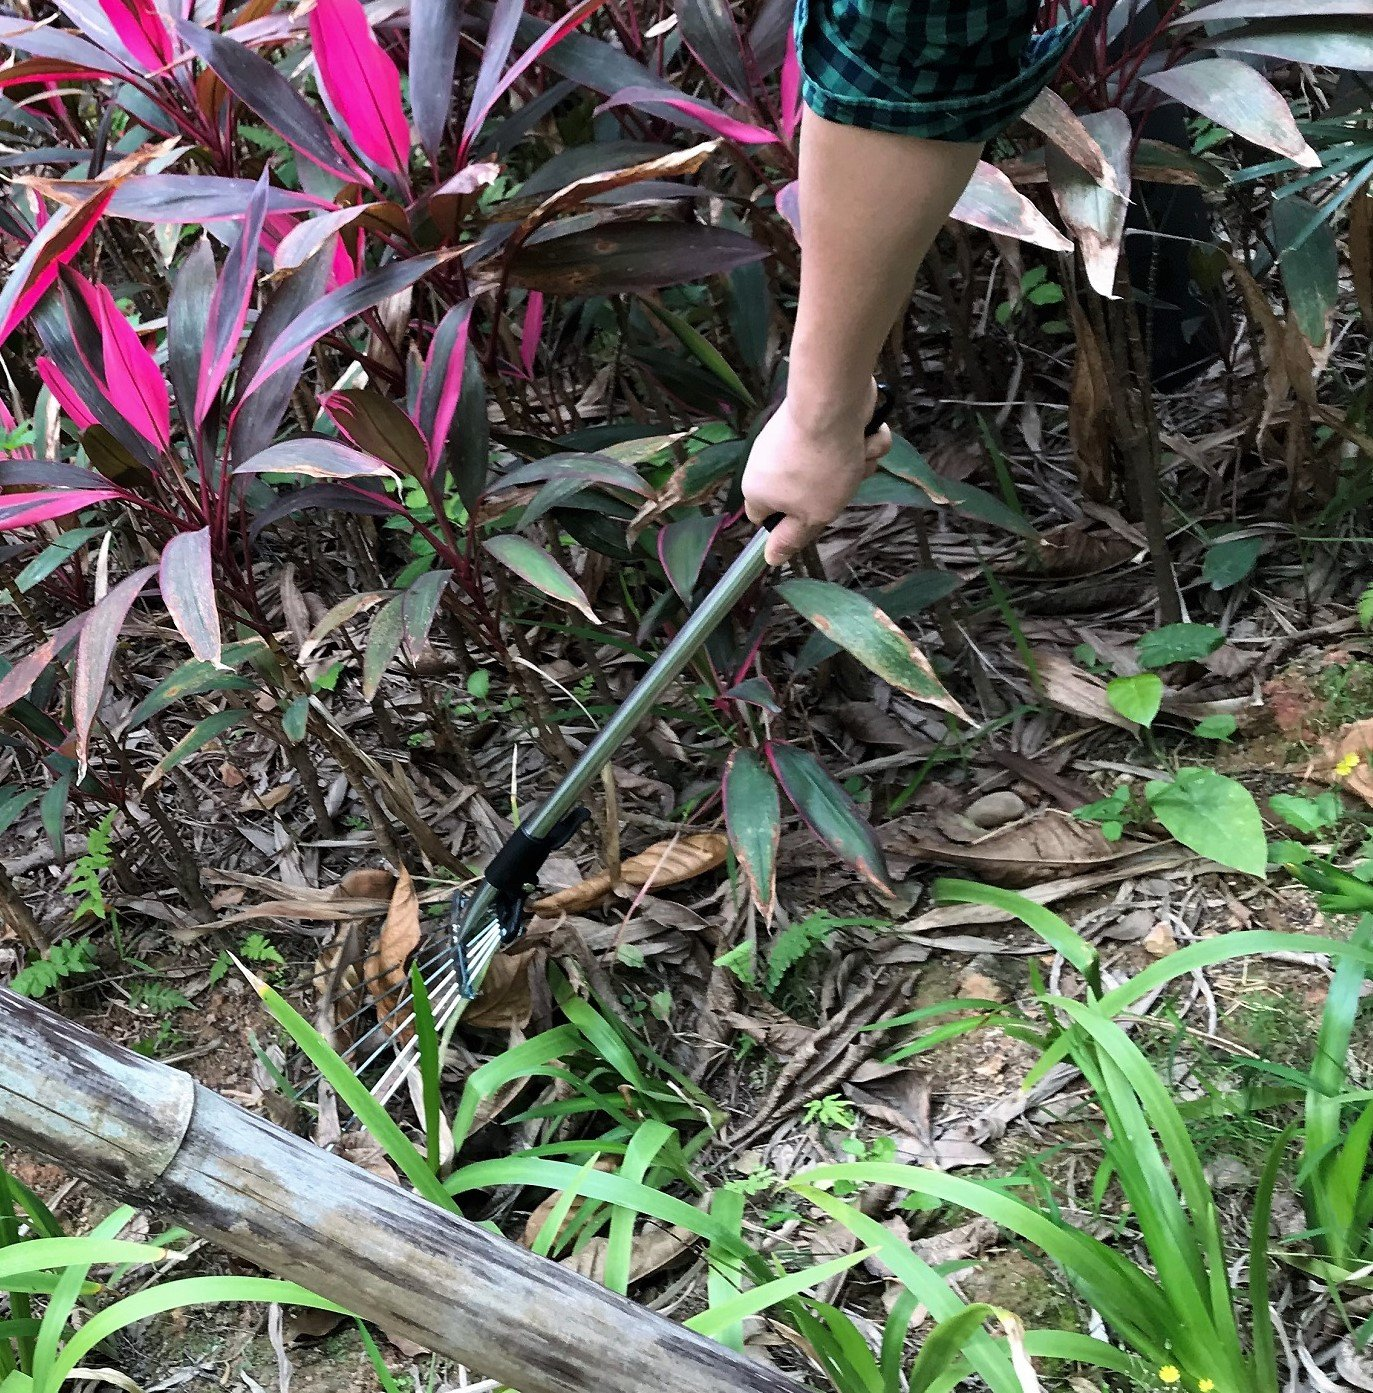 ZaoProteks ZP5802 Stainless Steel Garden Leaf Rakes, Hay Rake, Lawn rake (Black Handle) by ZP ZaoProteks (Image #7)